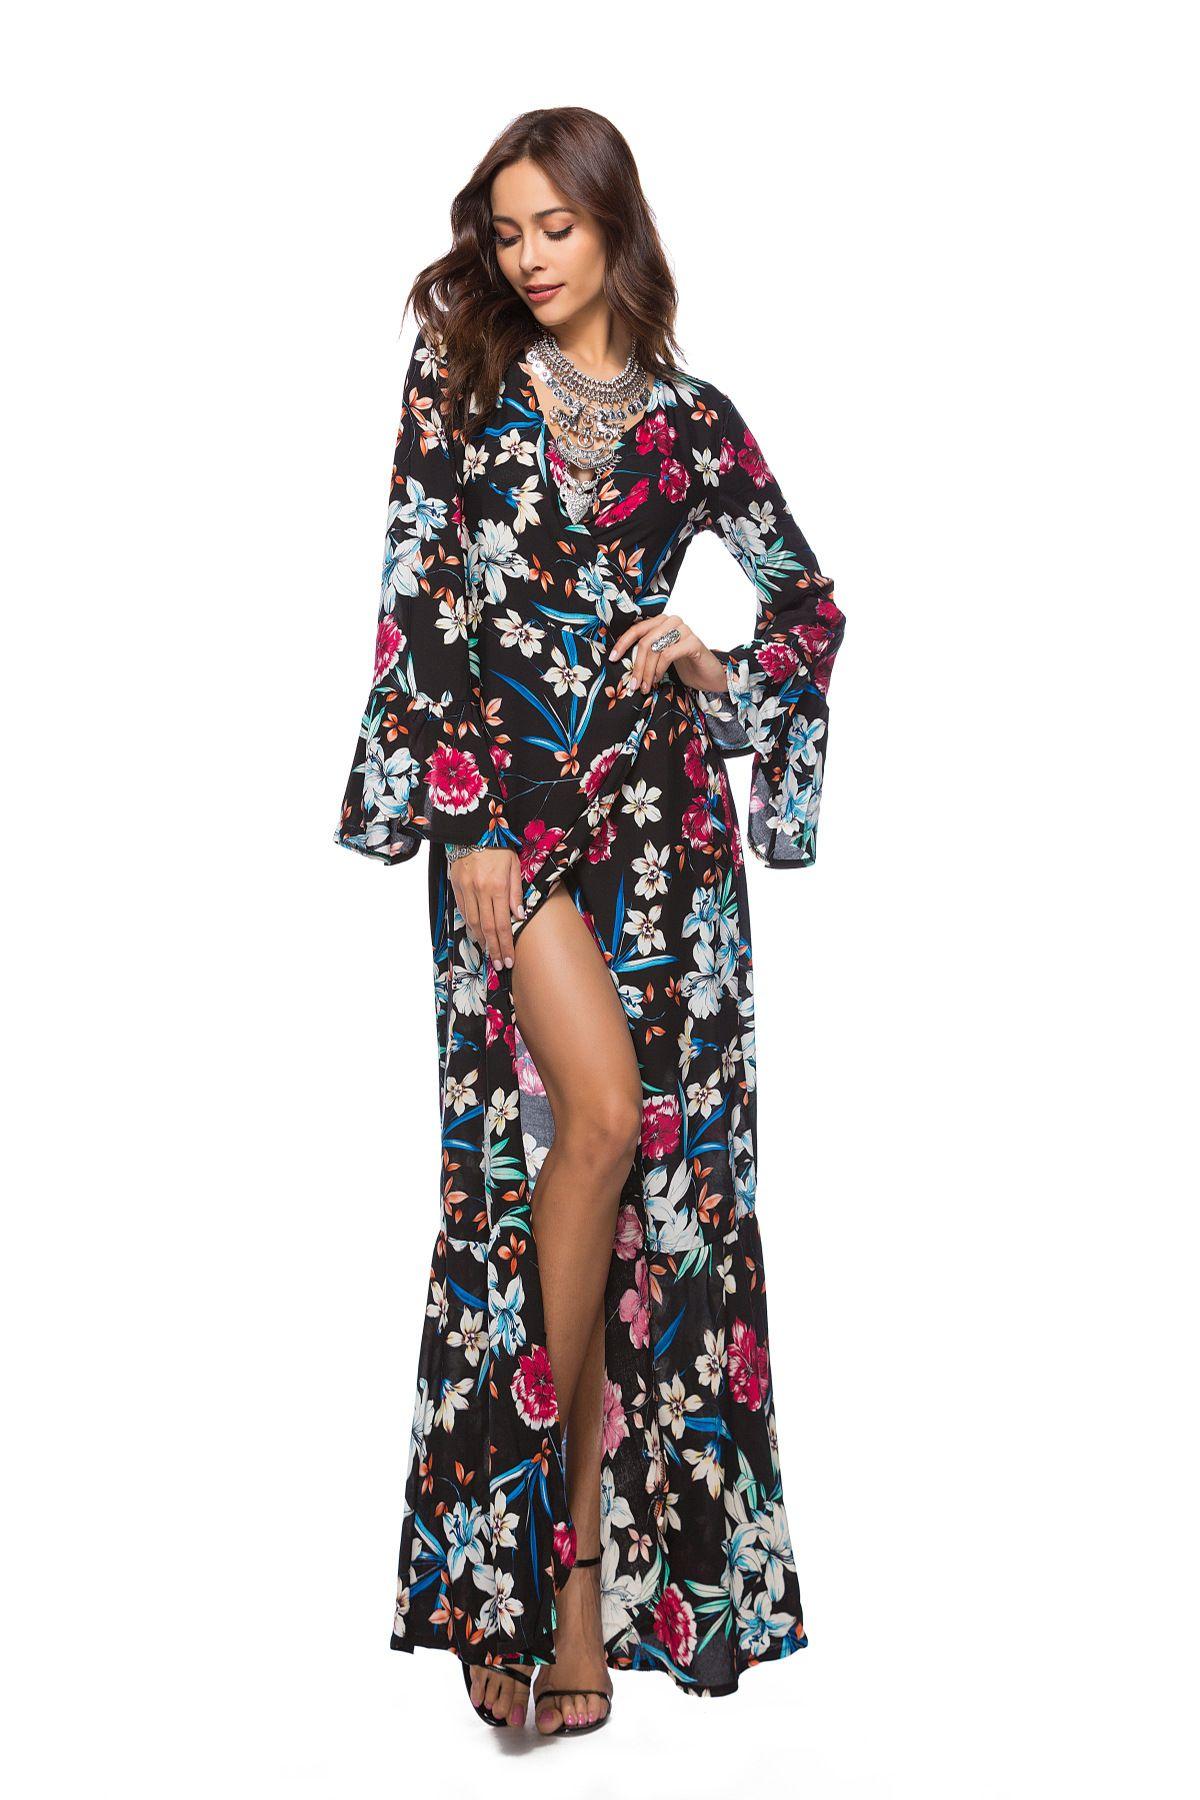 d3fe811fd33 Boho Women Casual Maxi Dress Retro Floral Print Dresses Beach Robe Femme  Fashion V Neck Flare Sleeve Autumn Split Sexy Dress Plus Size Dress For  Cocktail ...